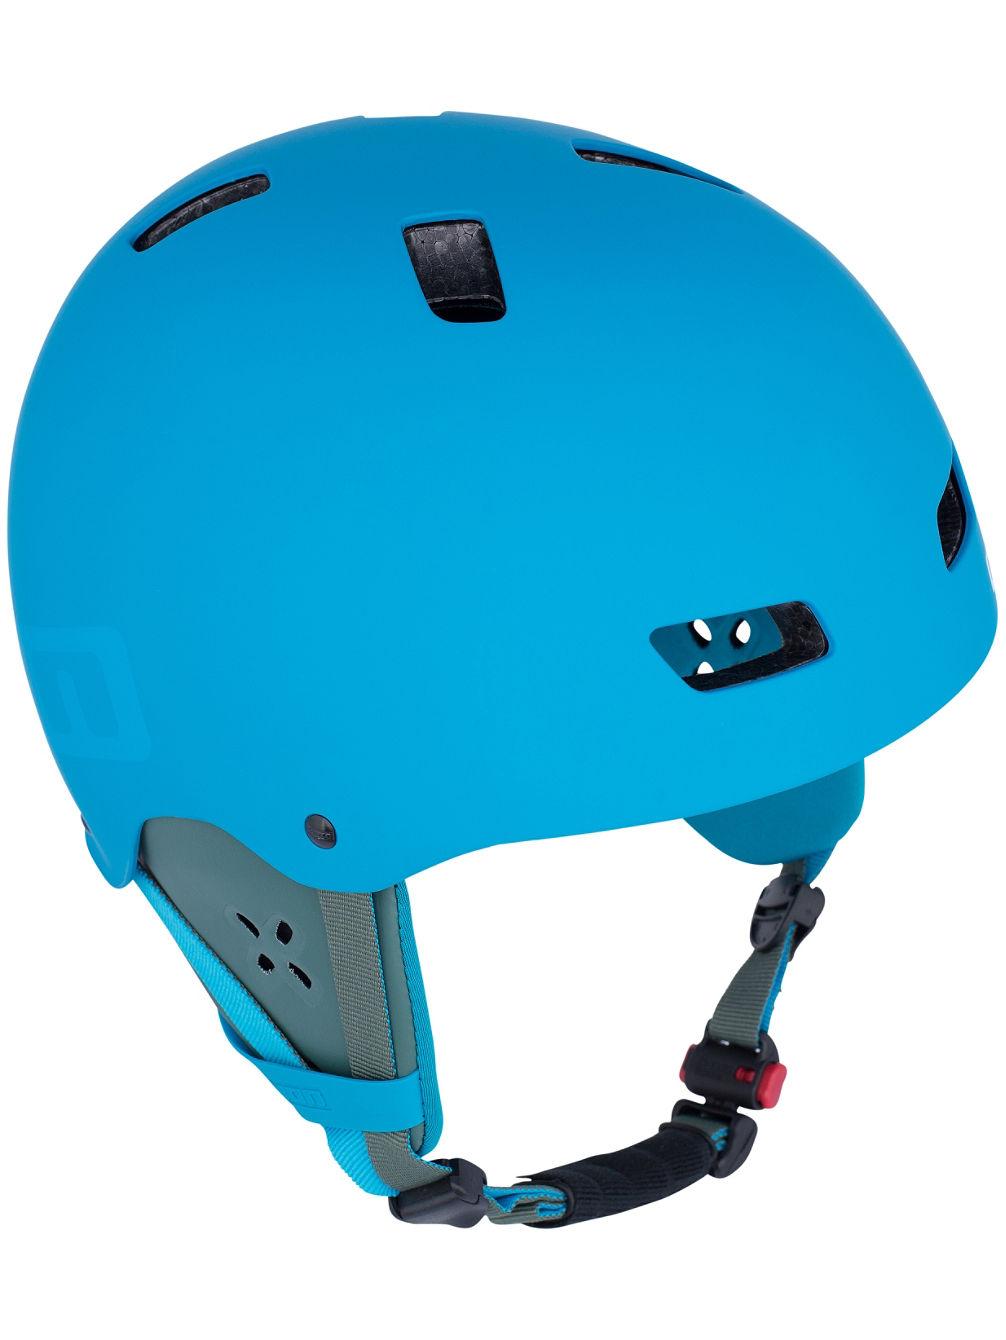 Ion Hardcap 3.0 Comfort